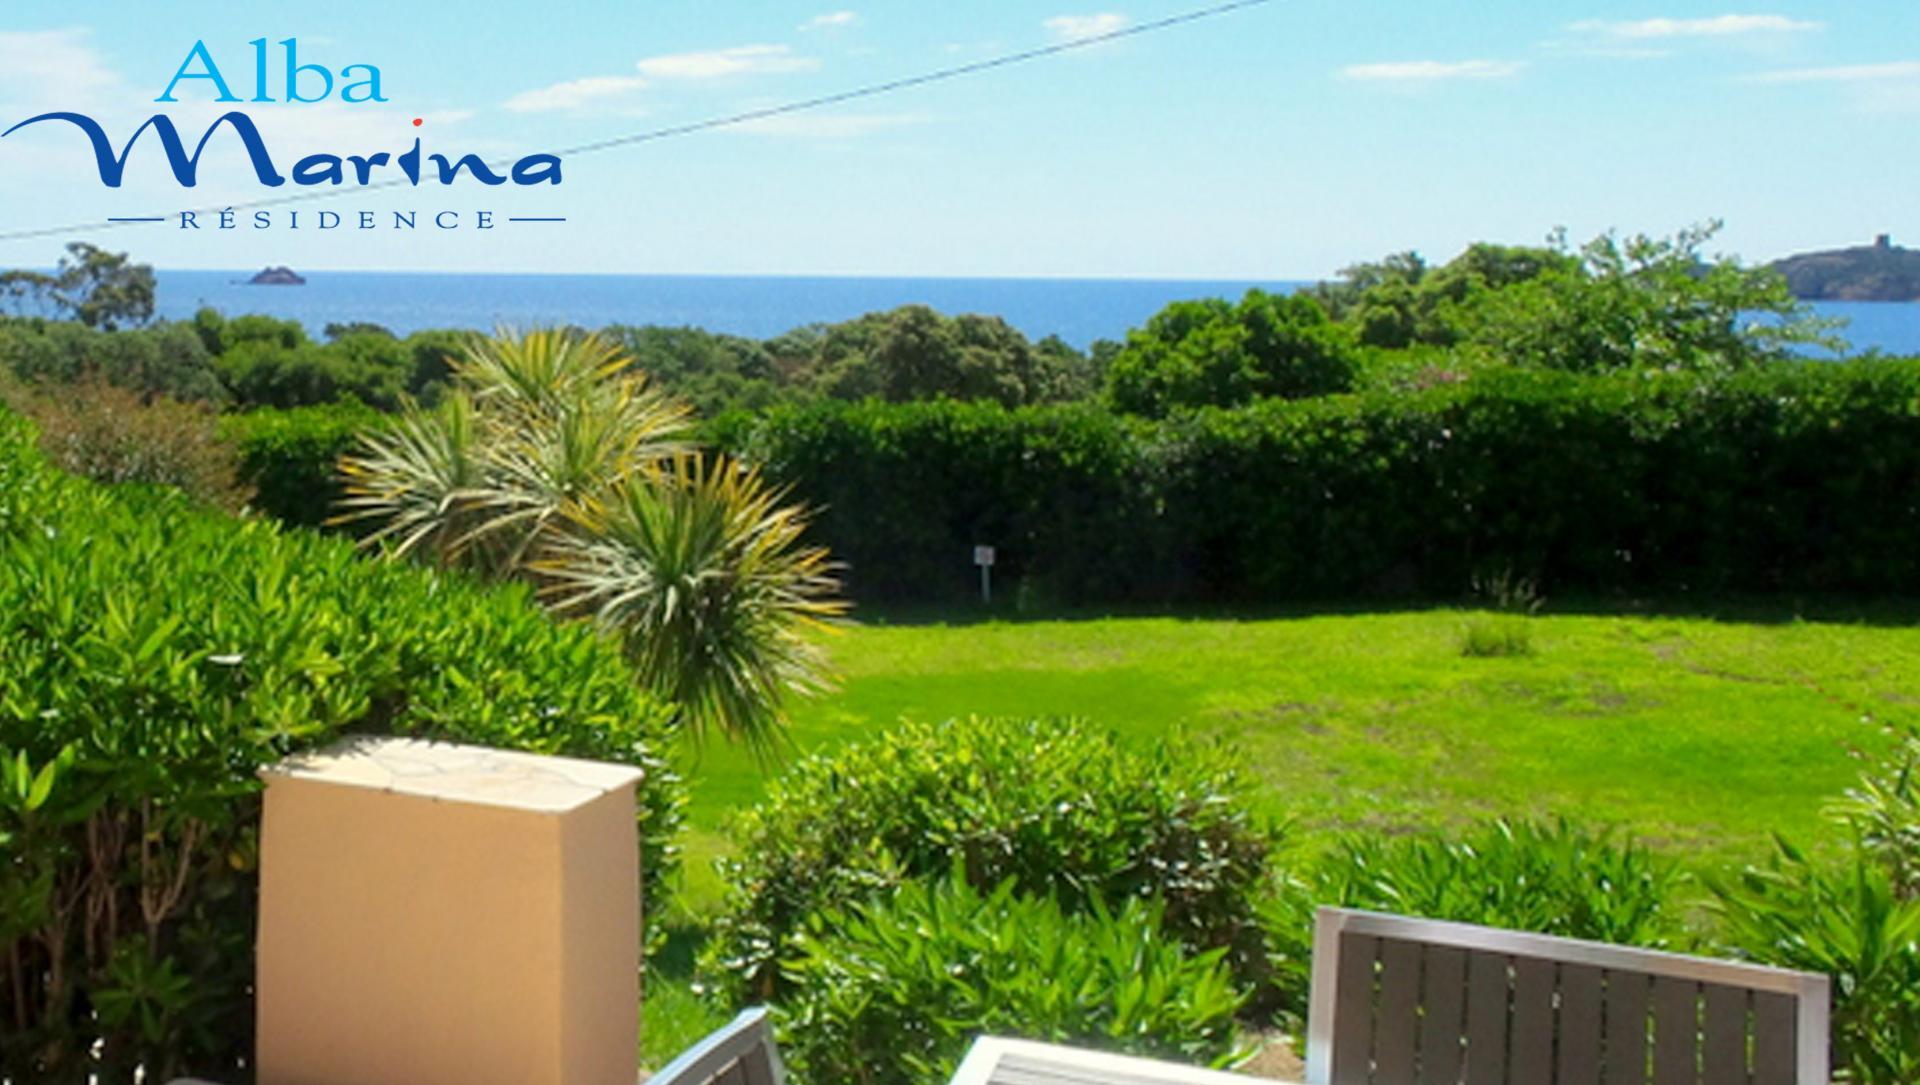 residence vacances corse du sud en bord de mer location avec piscine prs de porto vecchio location villa pinarello